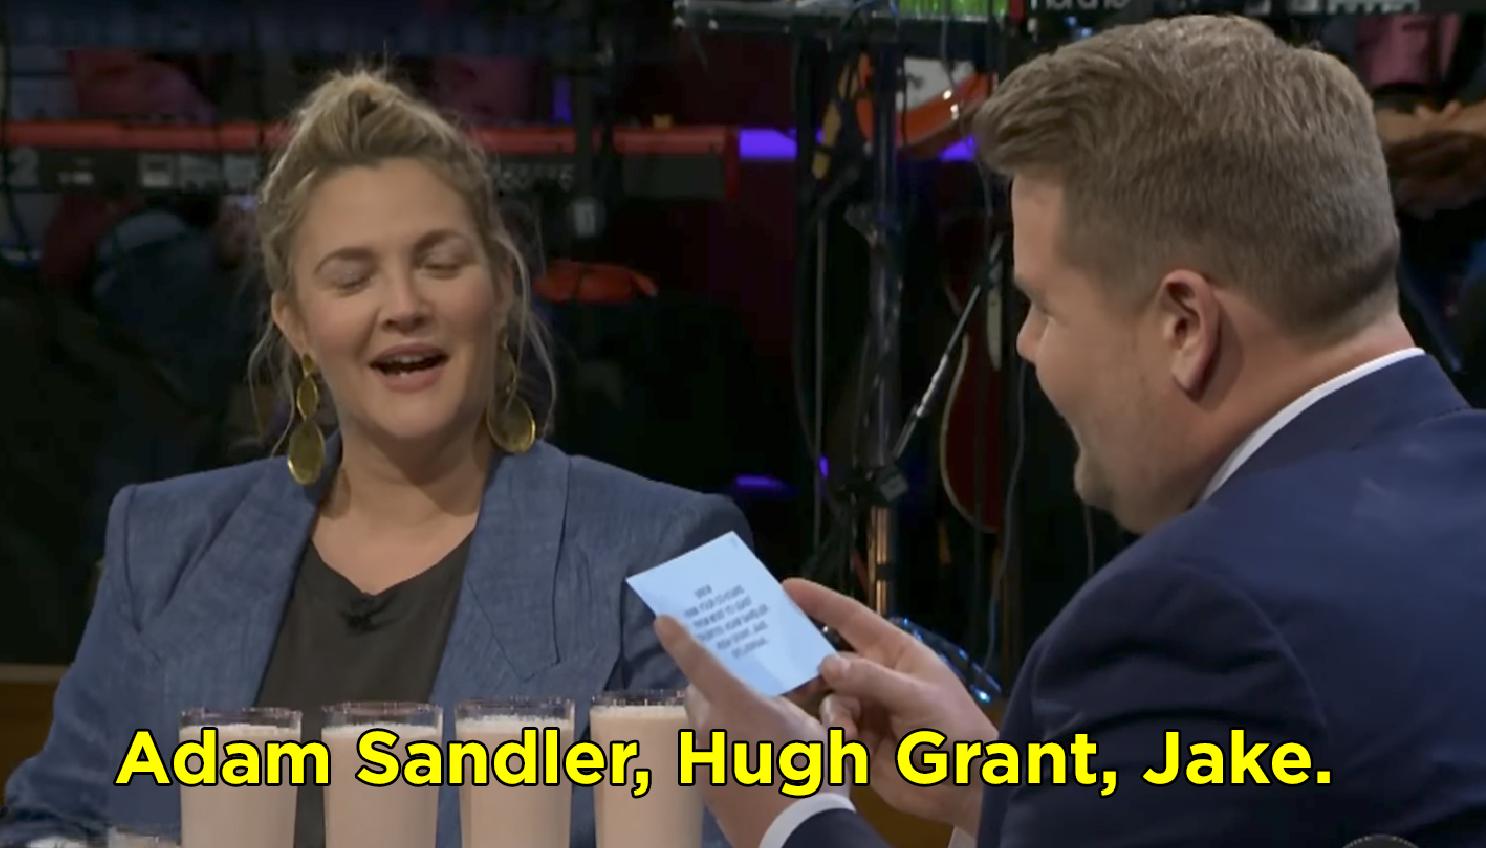 Drew Barrymore said Adam Sandler, Hugh Grant, Jake Gyllenhaal